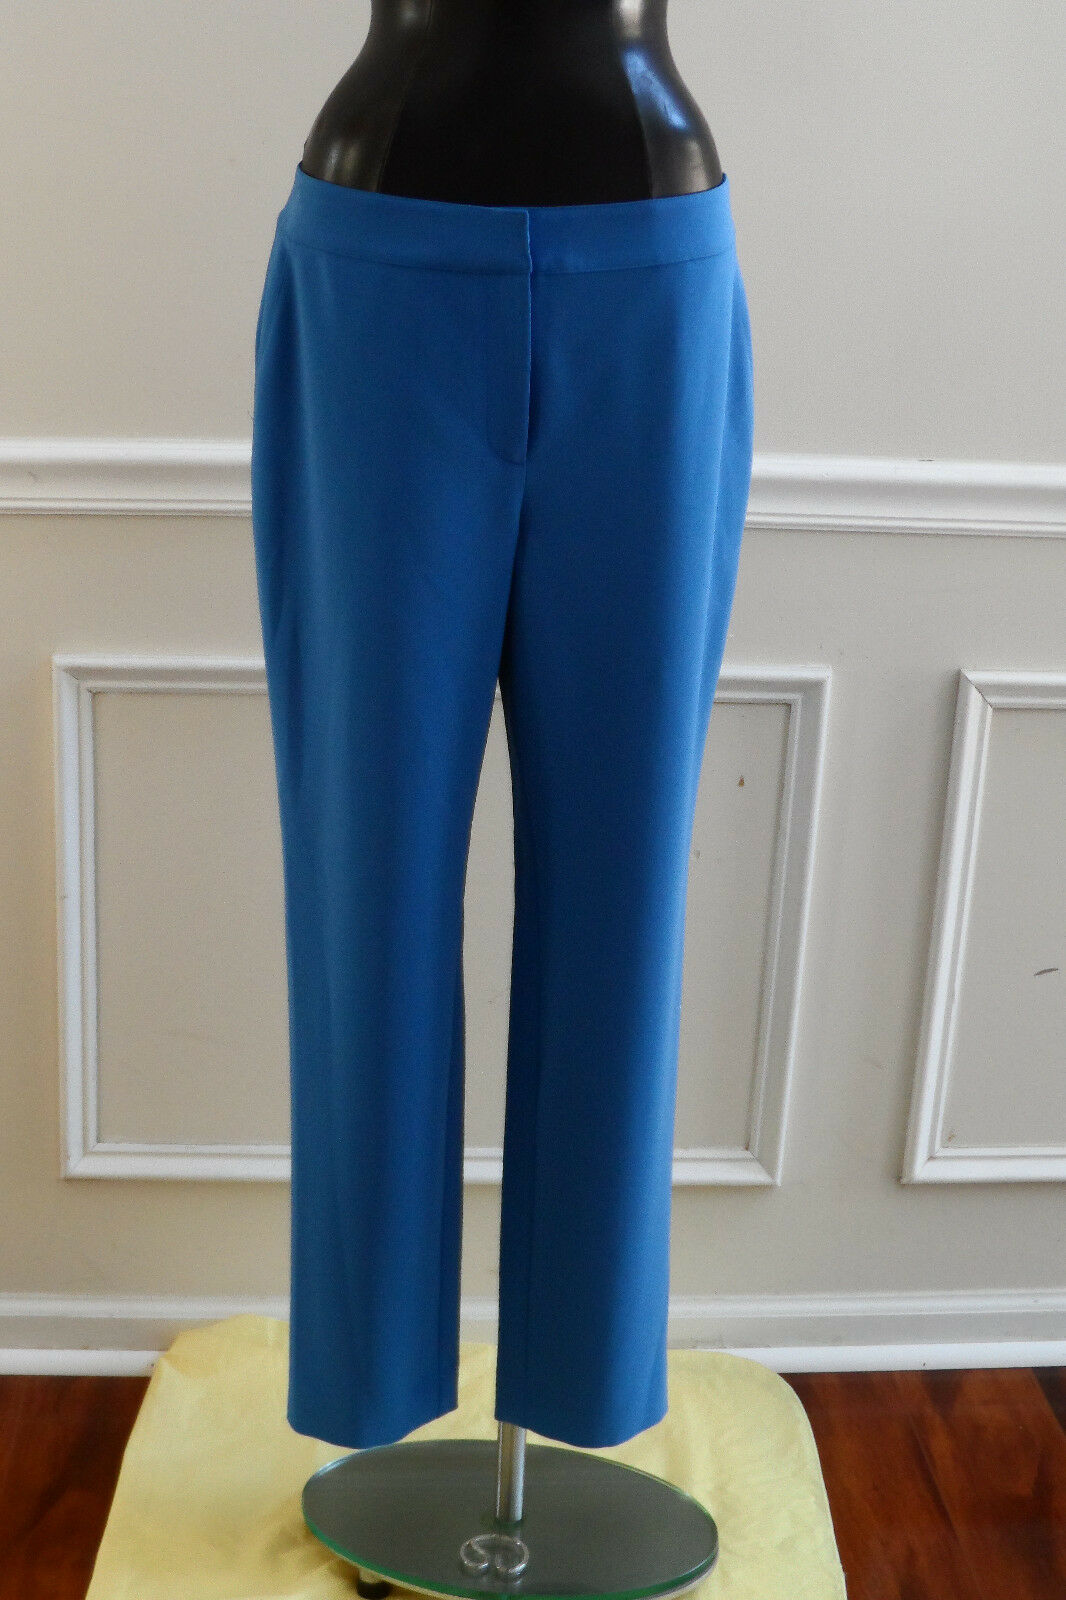 NEW ST.JOHN blueE DRESS PANT SIZE 10 (PACIFIC)